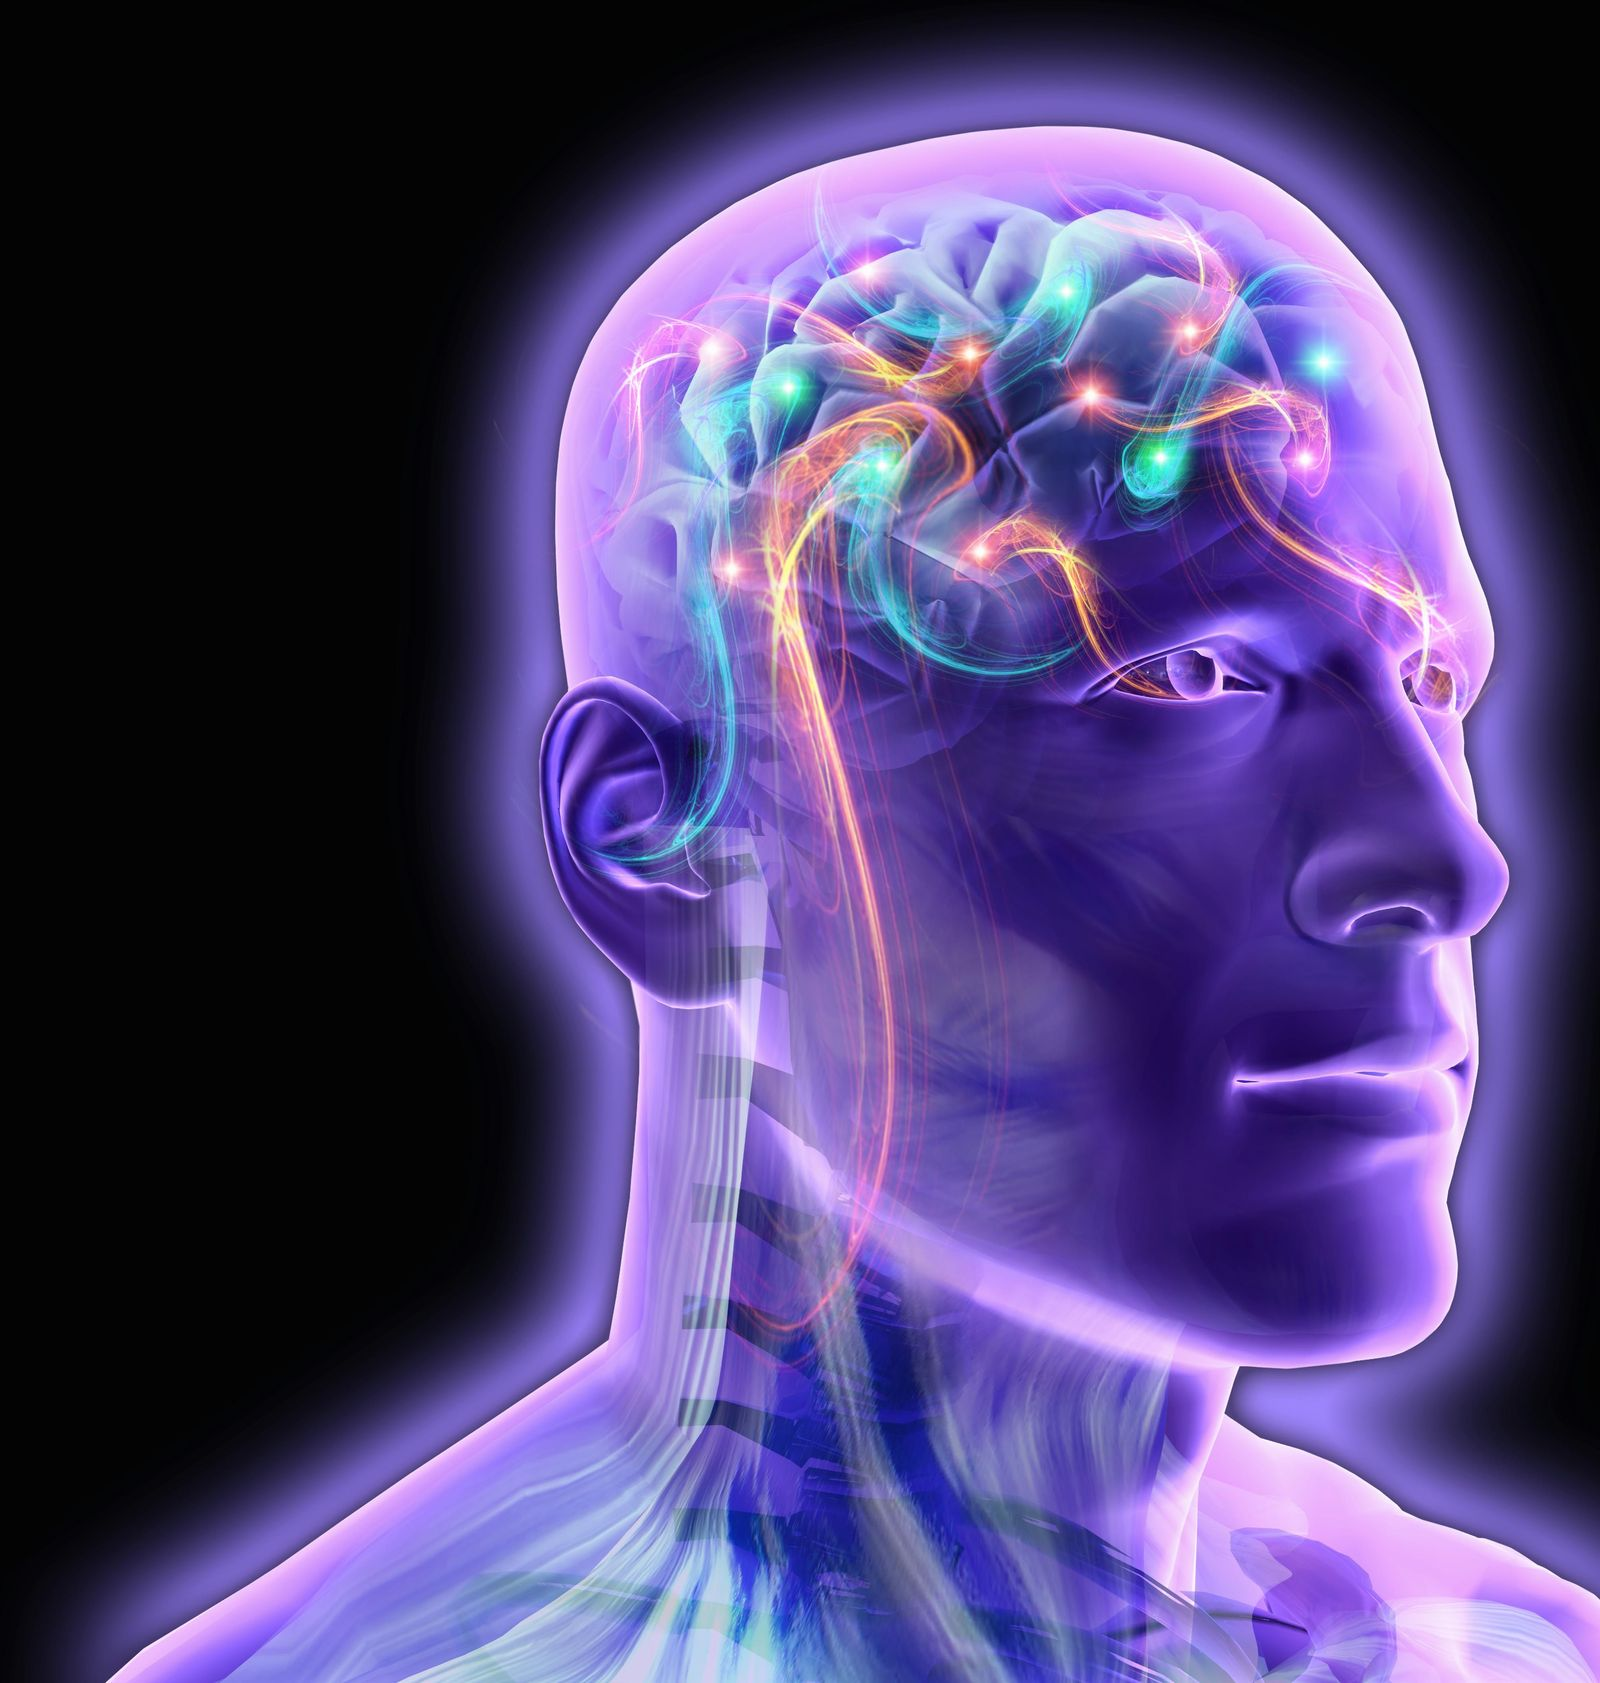 Gehirn / Gedächnis